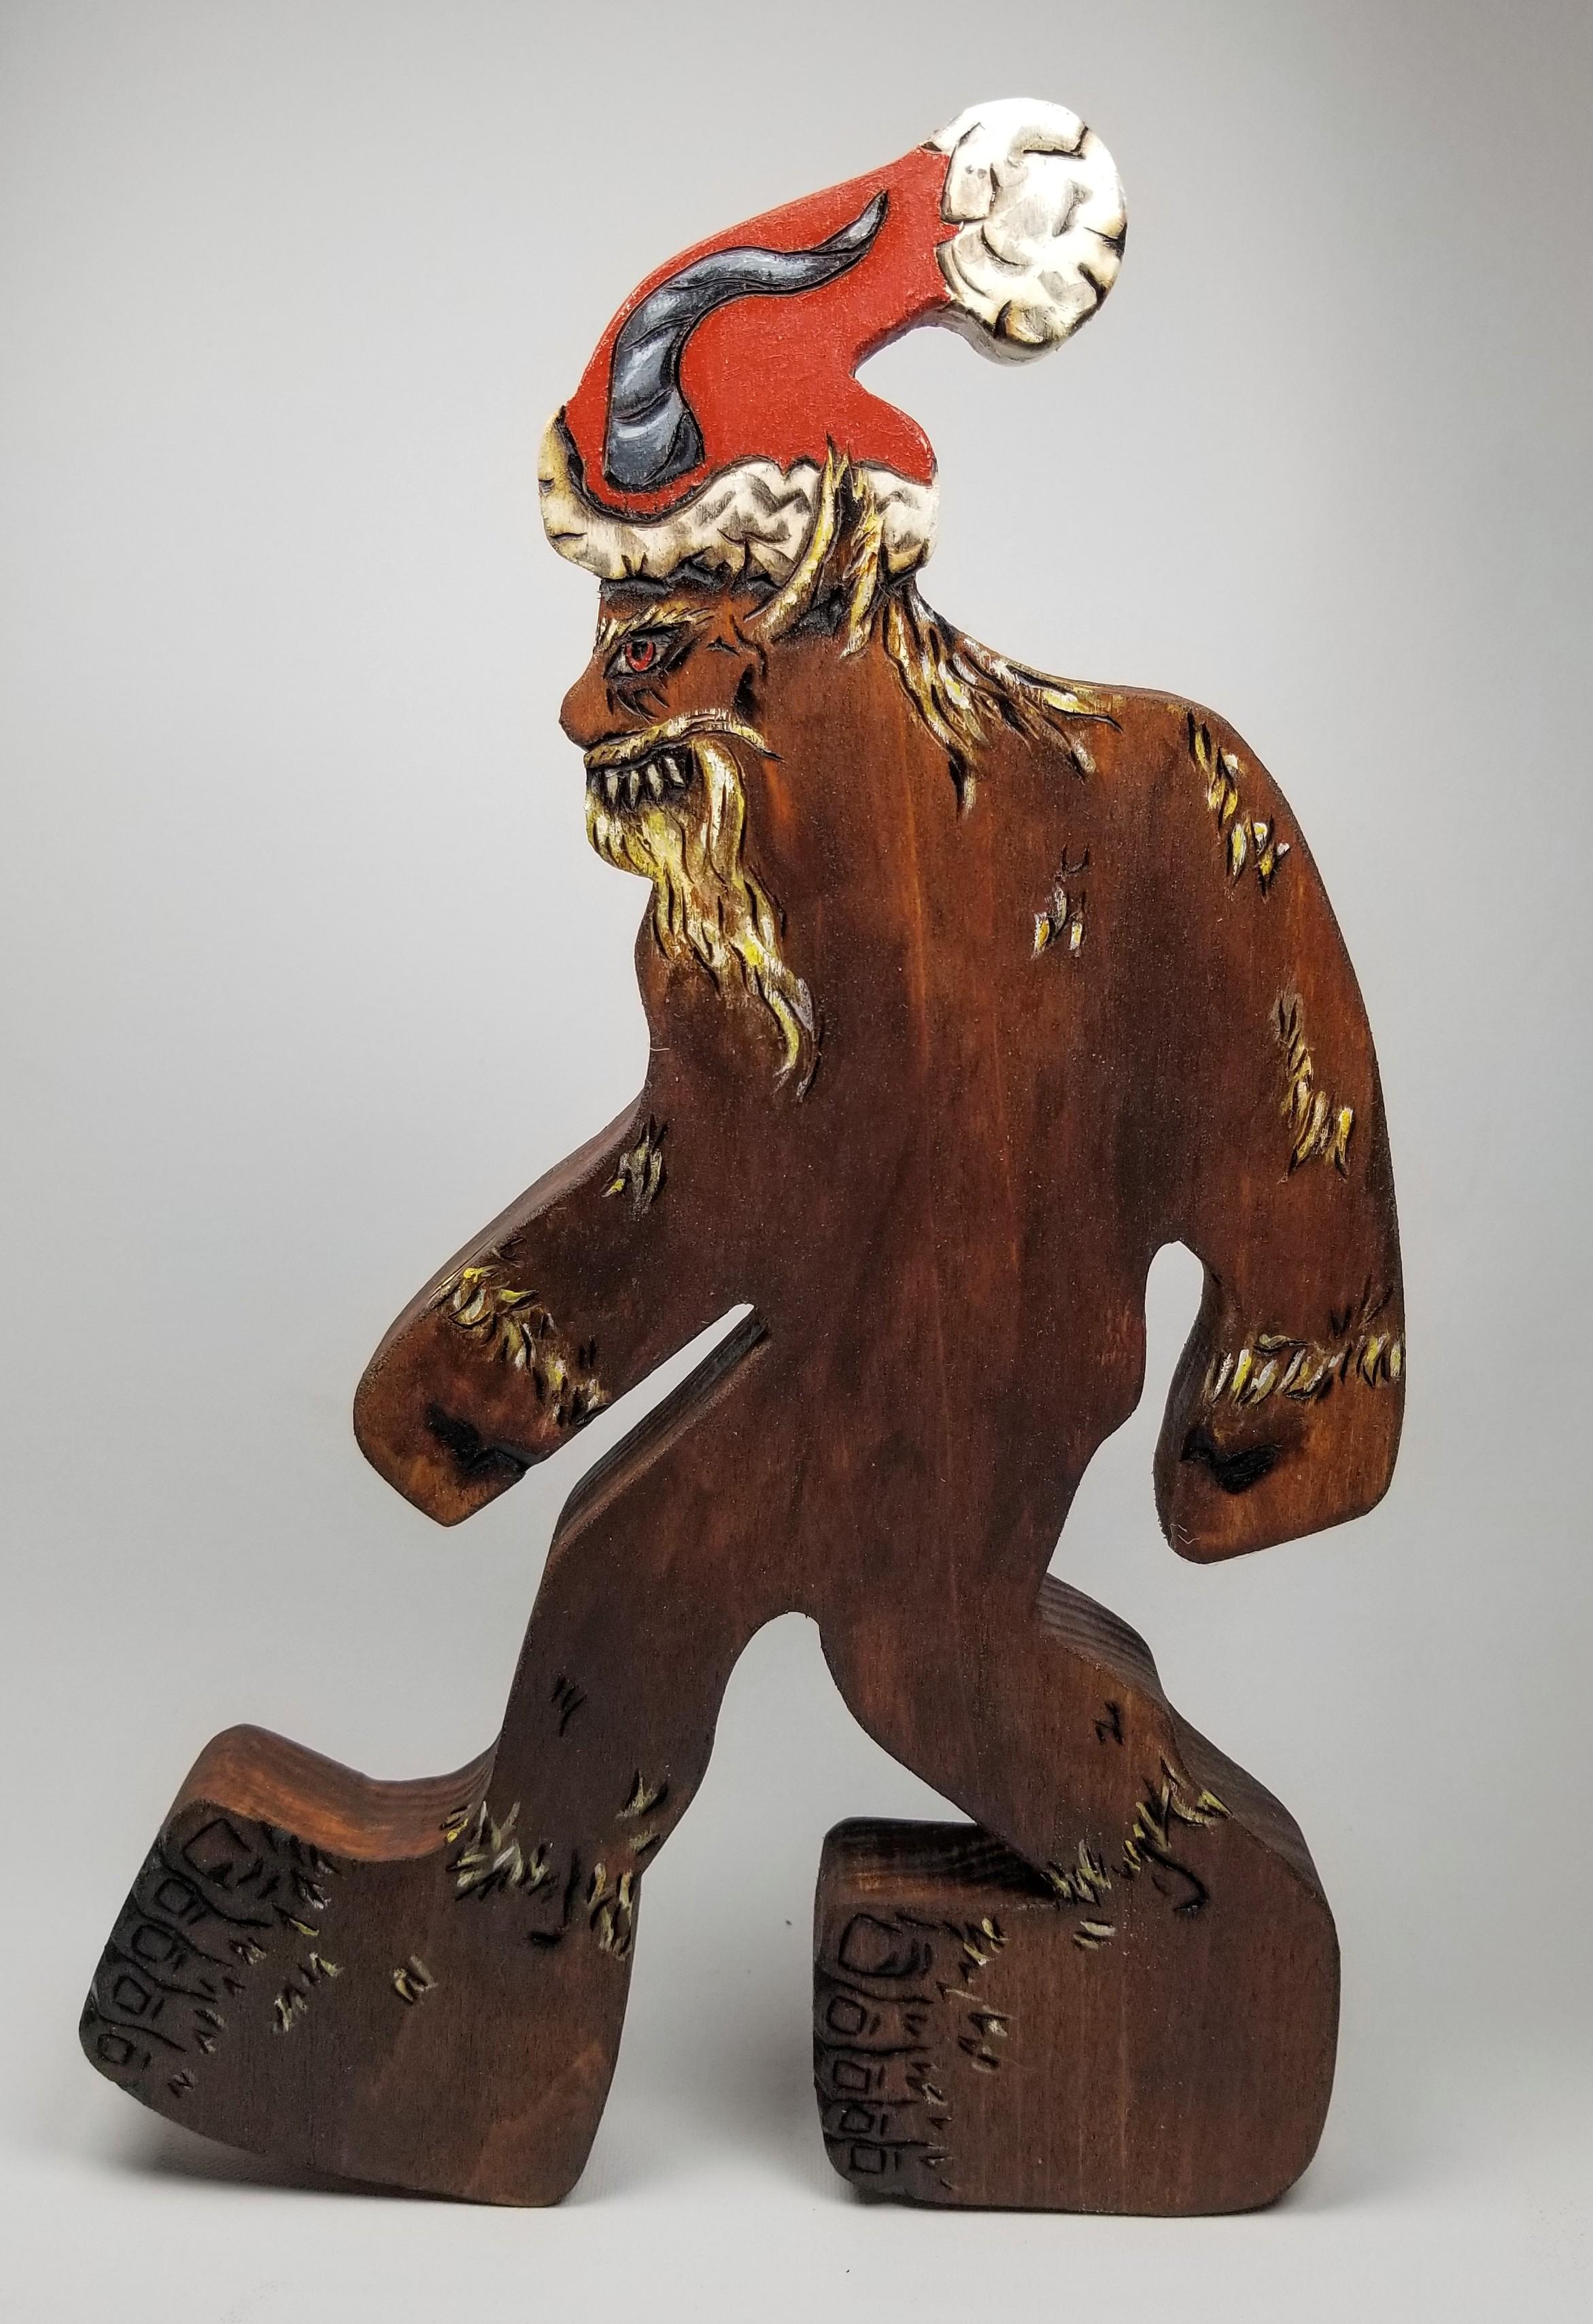 Bigfoot, Yeti, Sasquatch, Krampus!